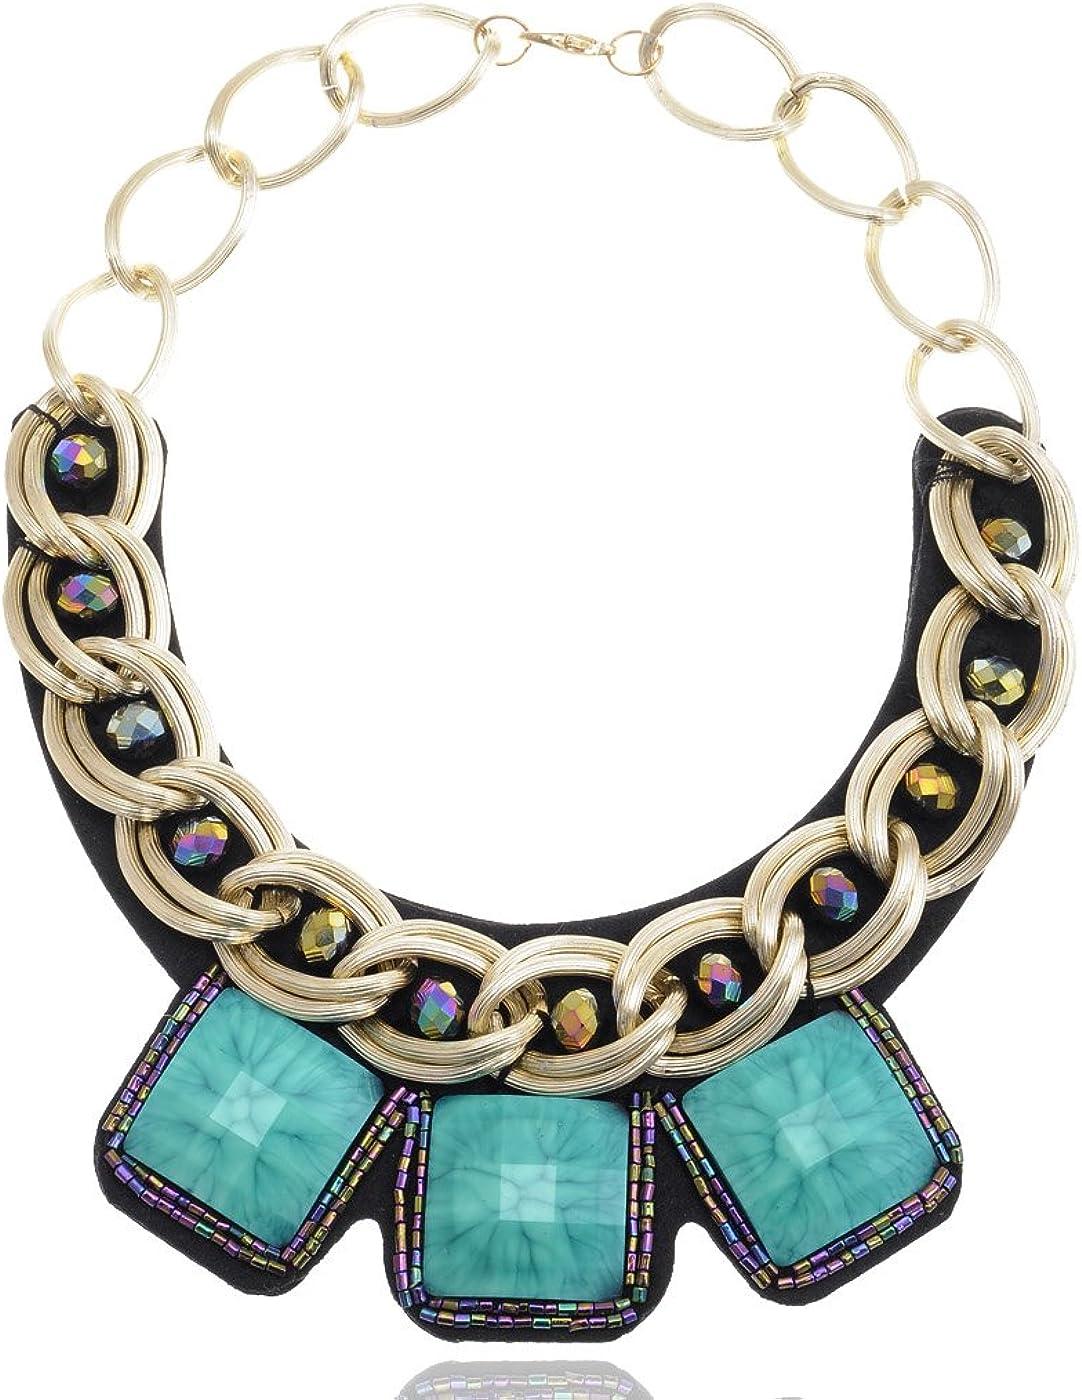 ALILANG Golden Tone Large Chain Turquoise Gem Rhinestones Beaded Tribal Bib Collar Necklace